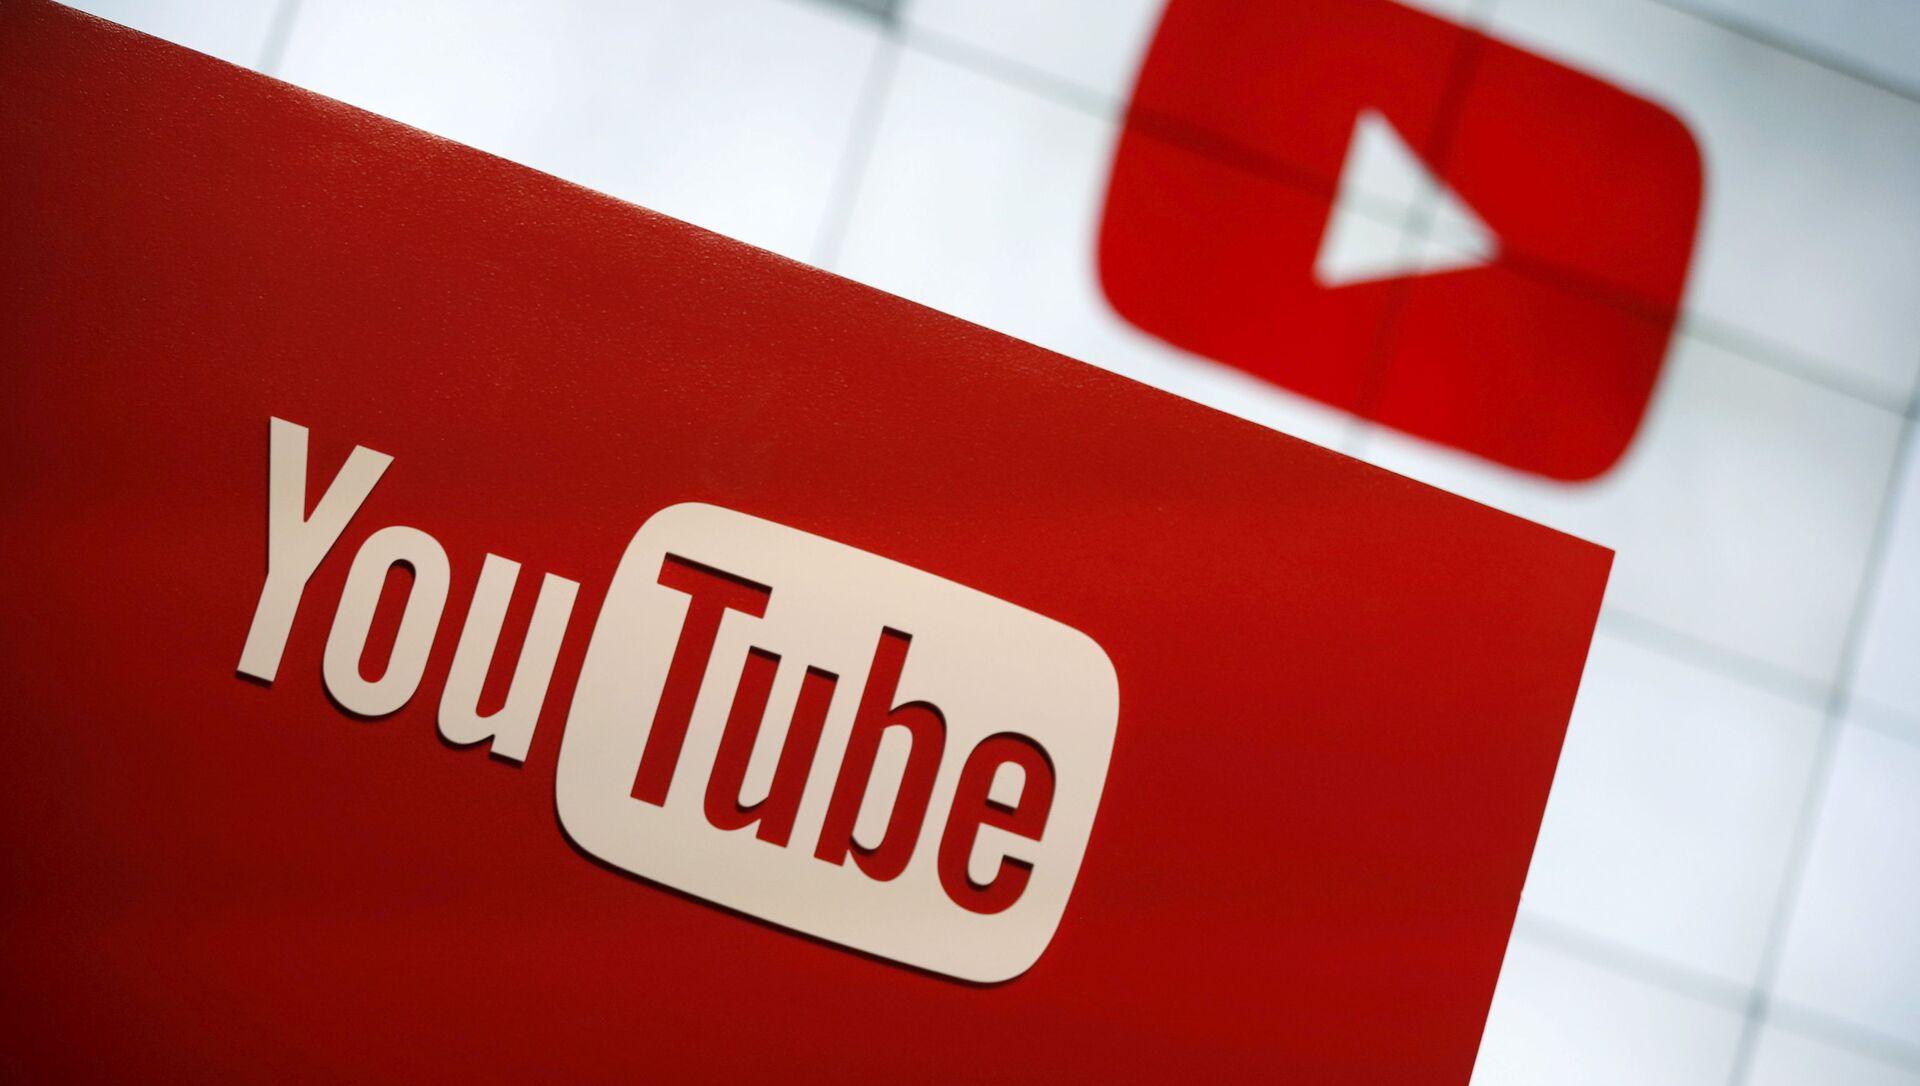 YouTube logo at the YouTube Space LA in Playa Del Rey, Los Angeles, California, United States October 21, 2015. - Sputnik International, 1920, 01.08.2021